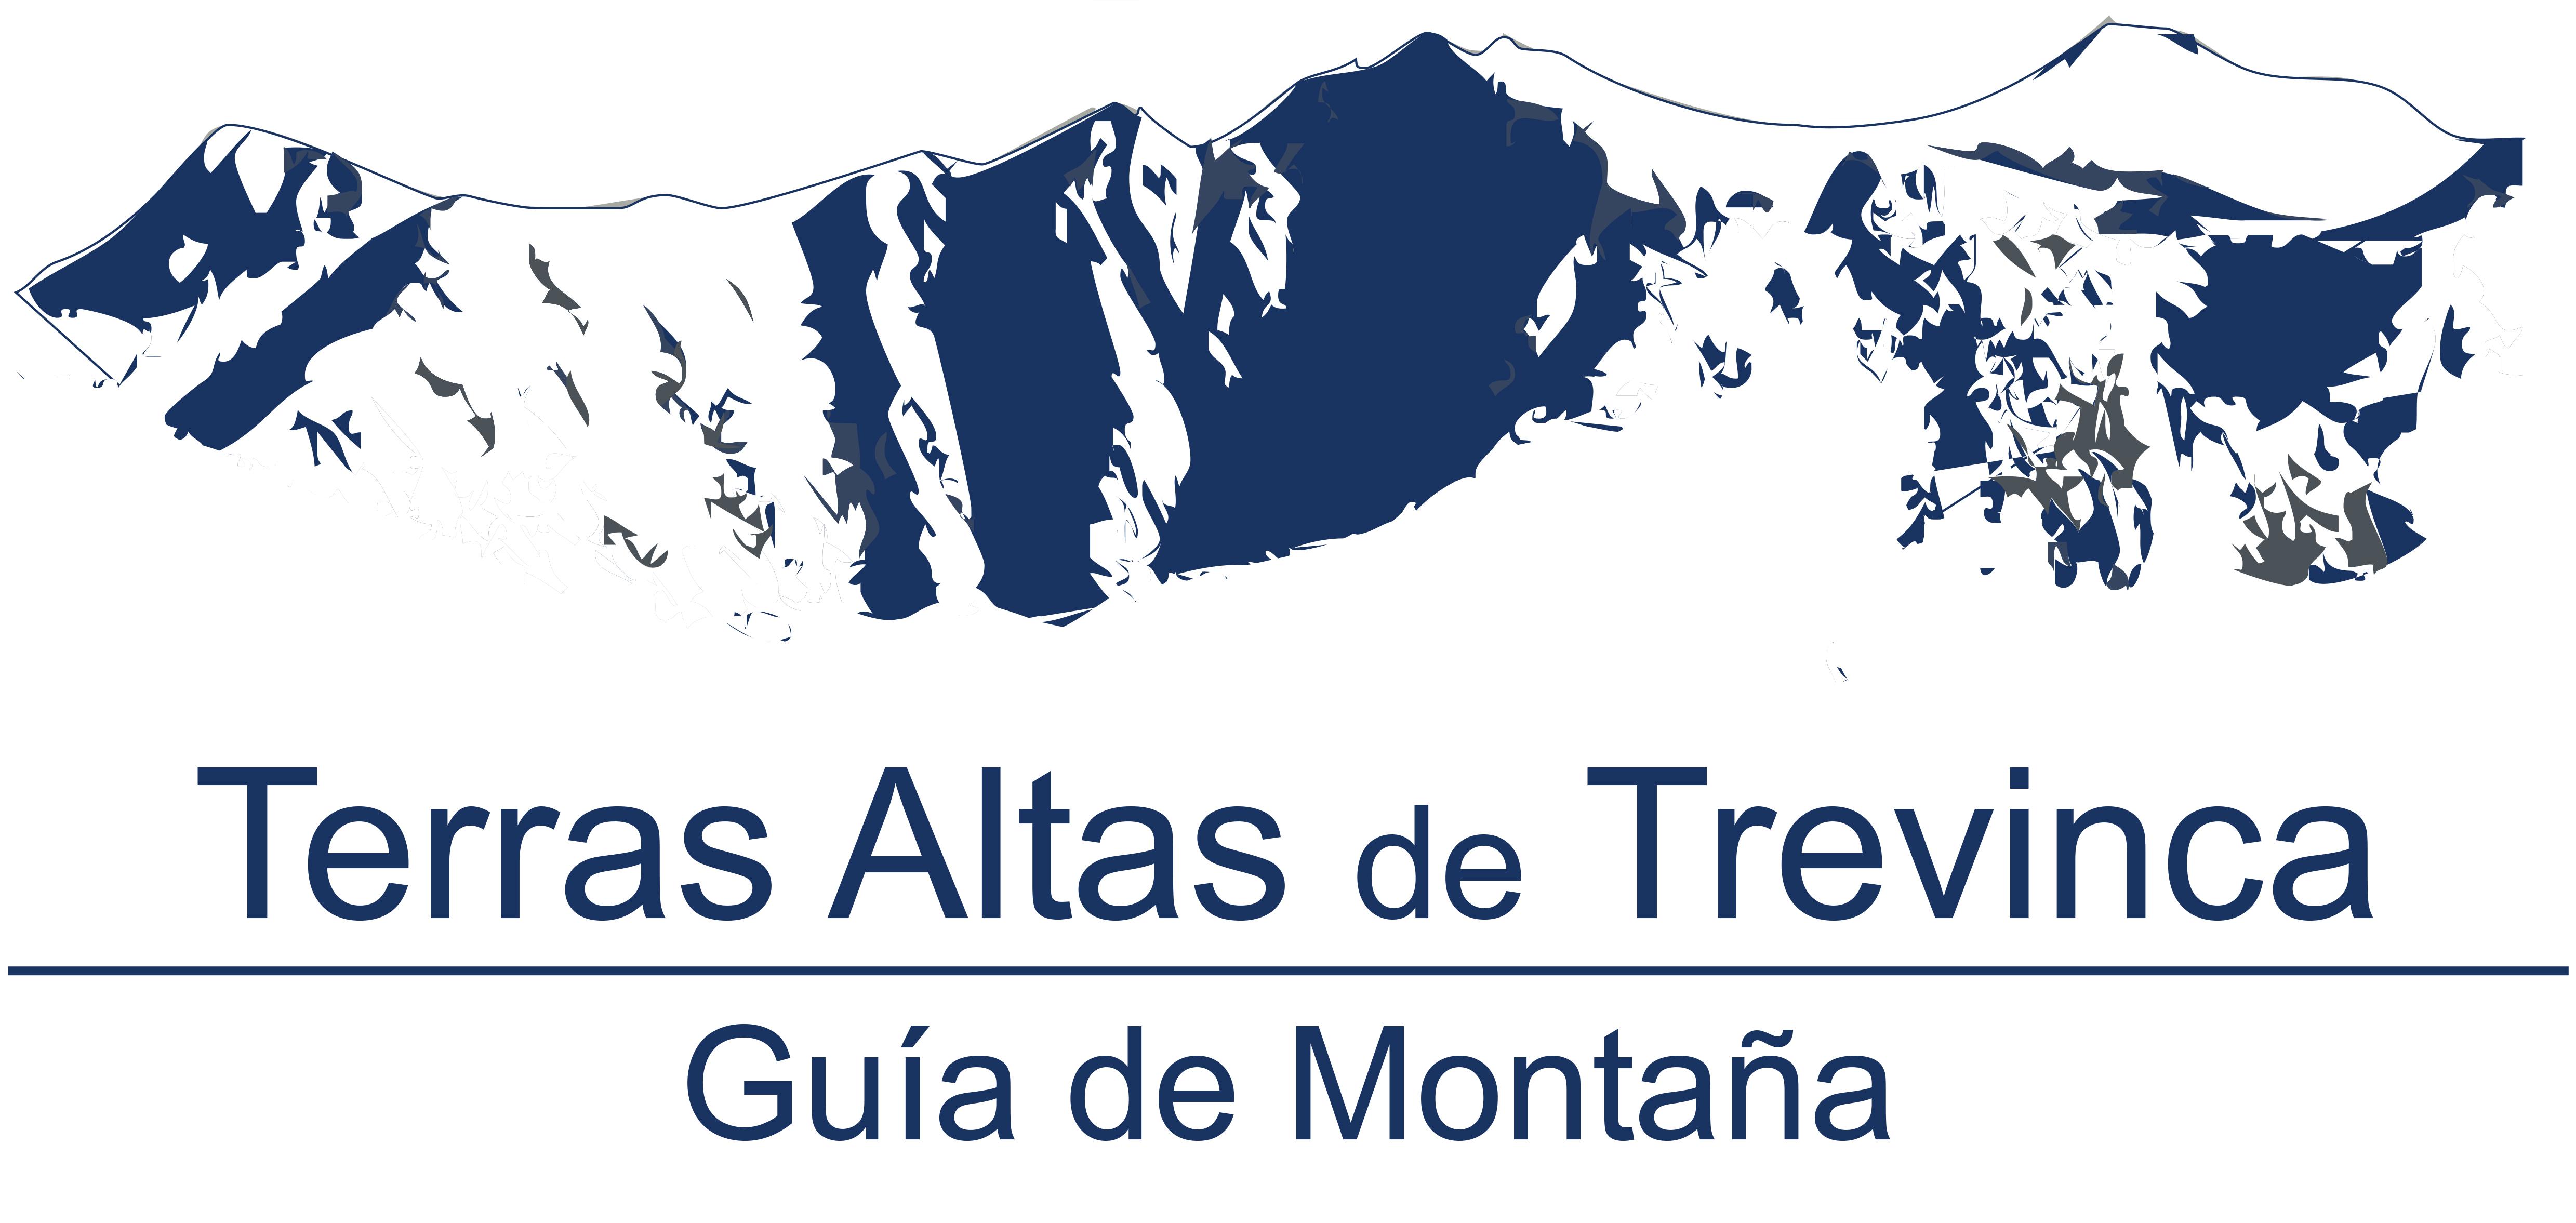 logo Terras Altas de Trevinca